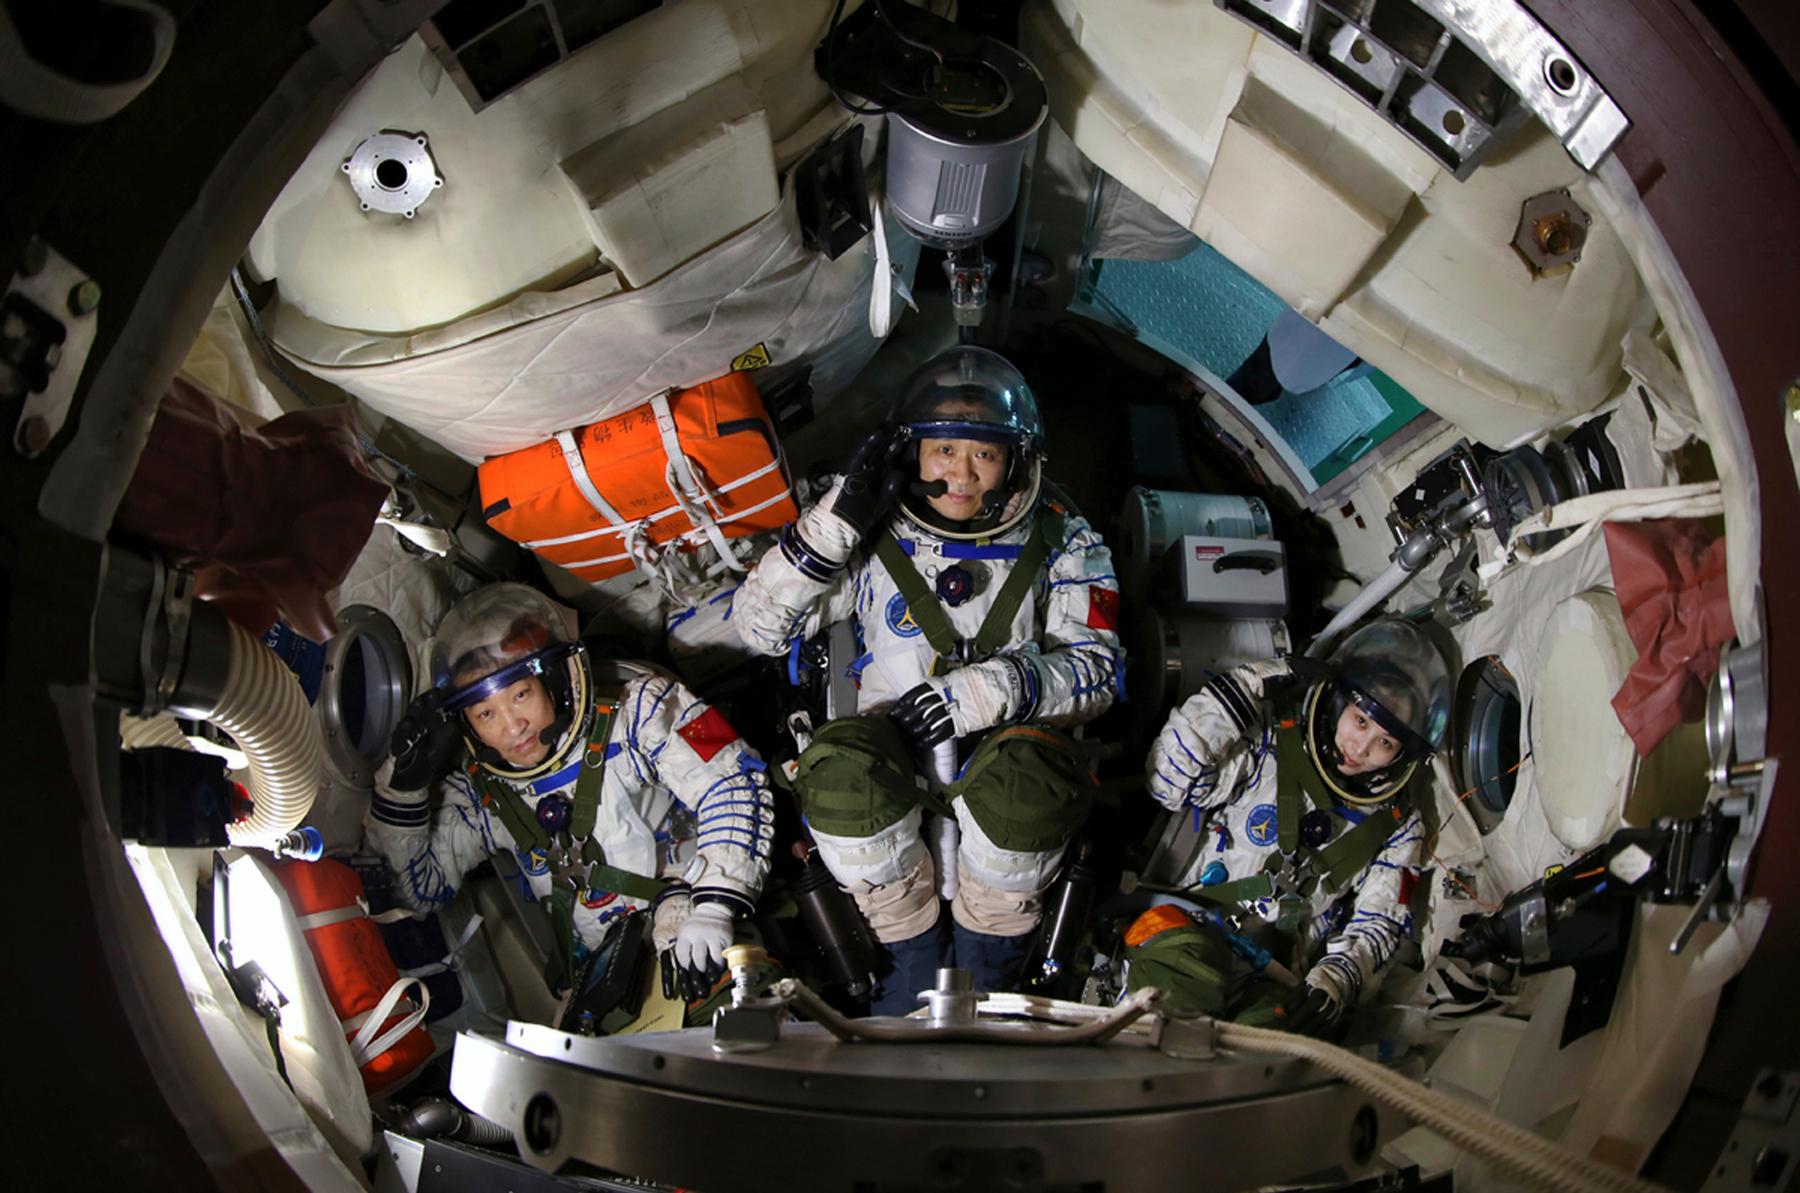 Chinese astronauts (from L to R) Zhang Xiaoguang, Nie Haisheng and Wang Yapin